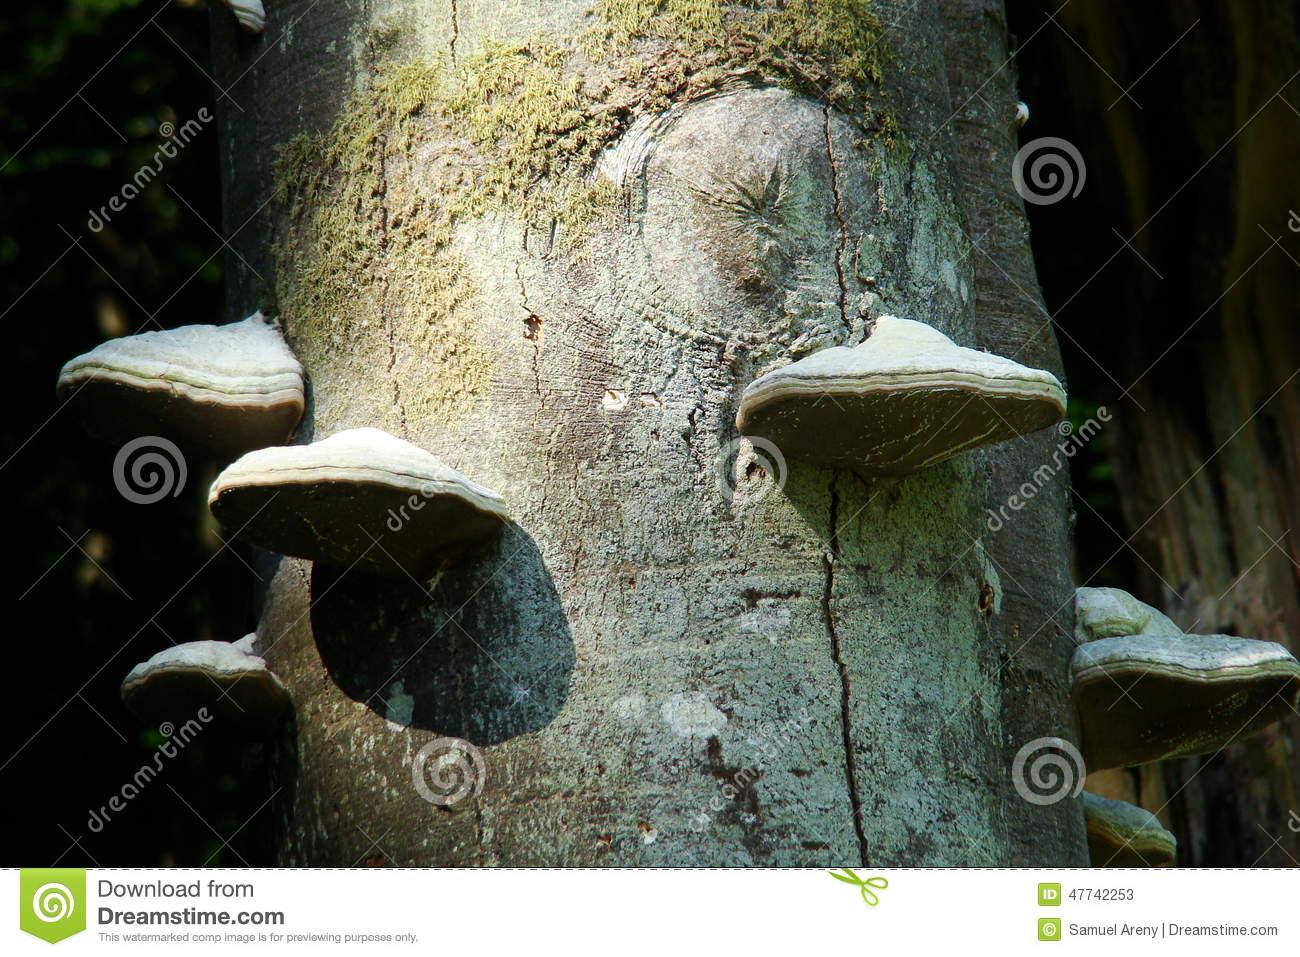 Tinder Fungus Or Tinder Polypore Stock Photo.